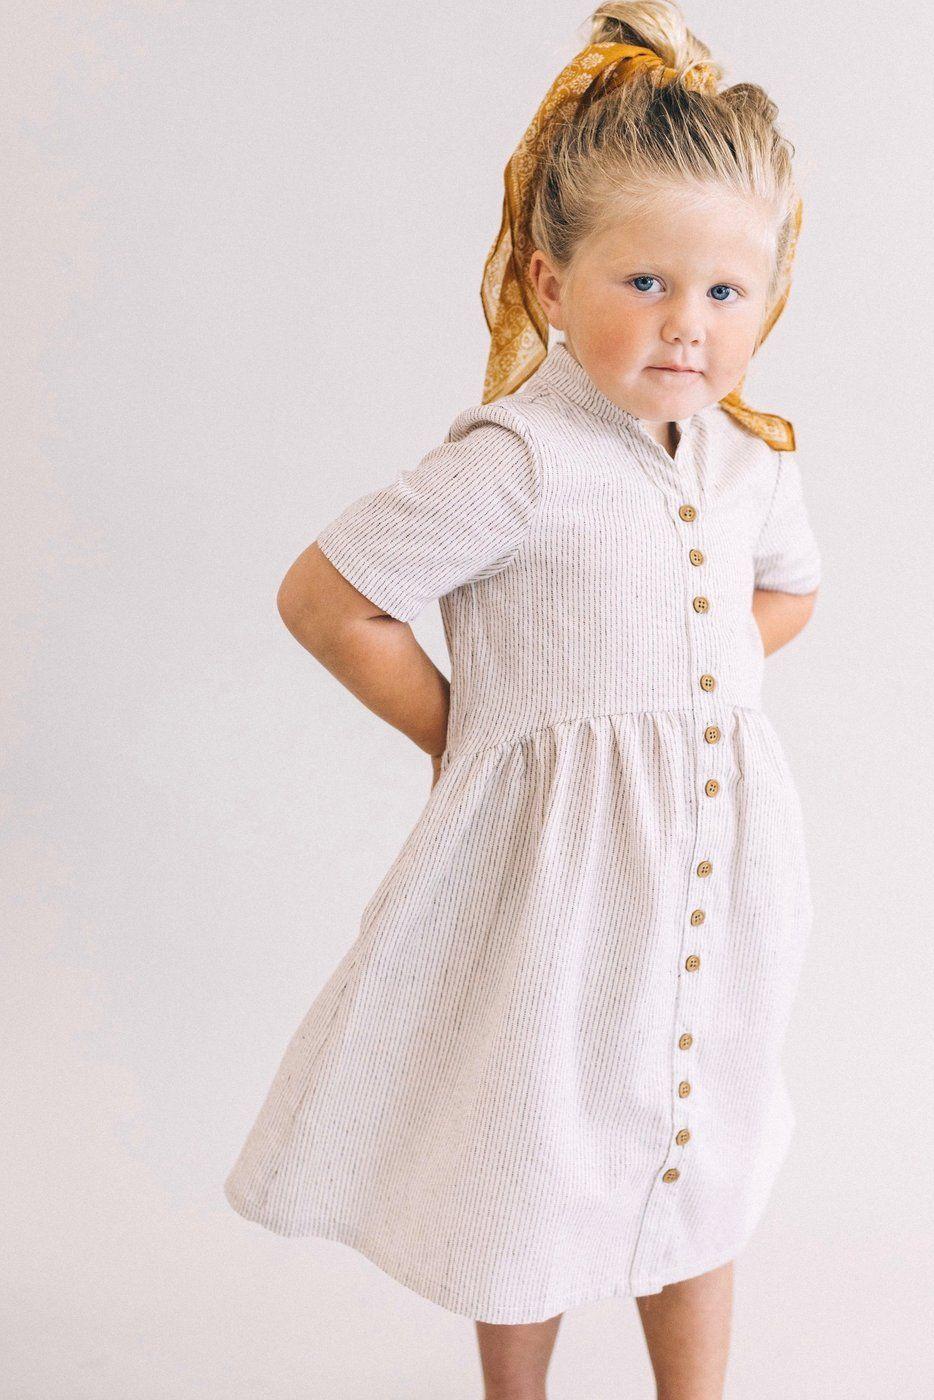 Mini Clements Woven Dress Roolee Kids Kids Fashion Boys